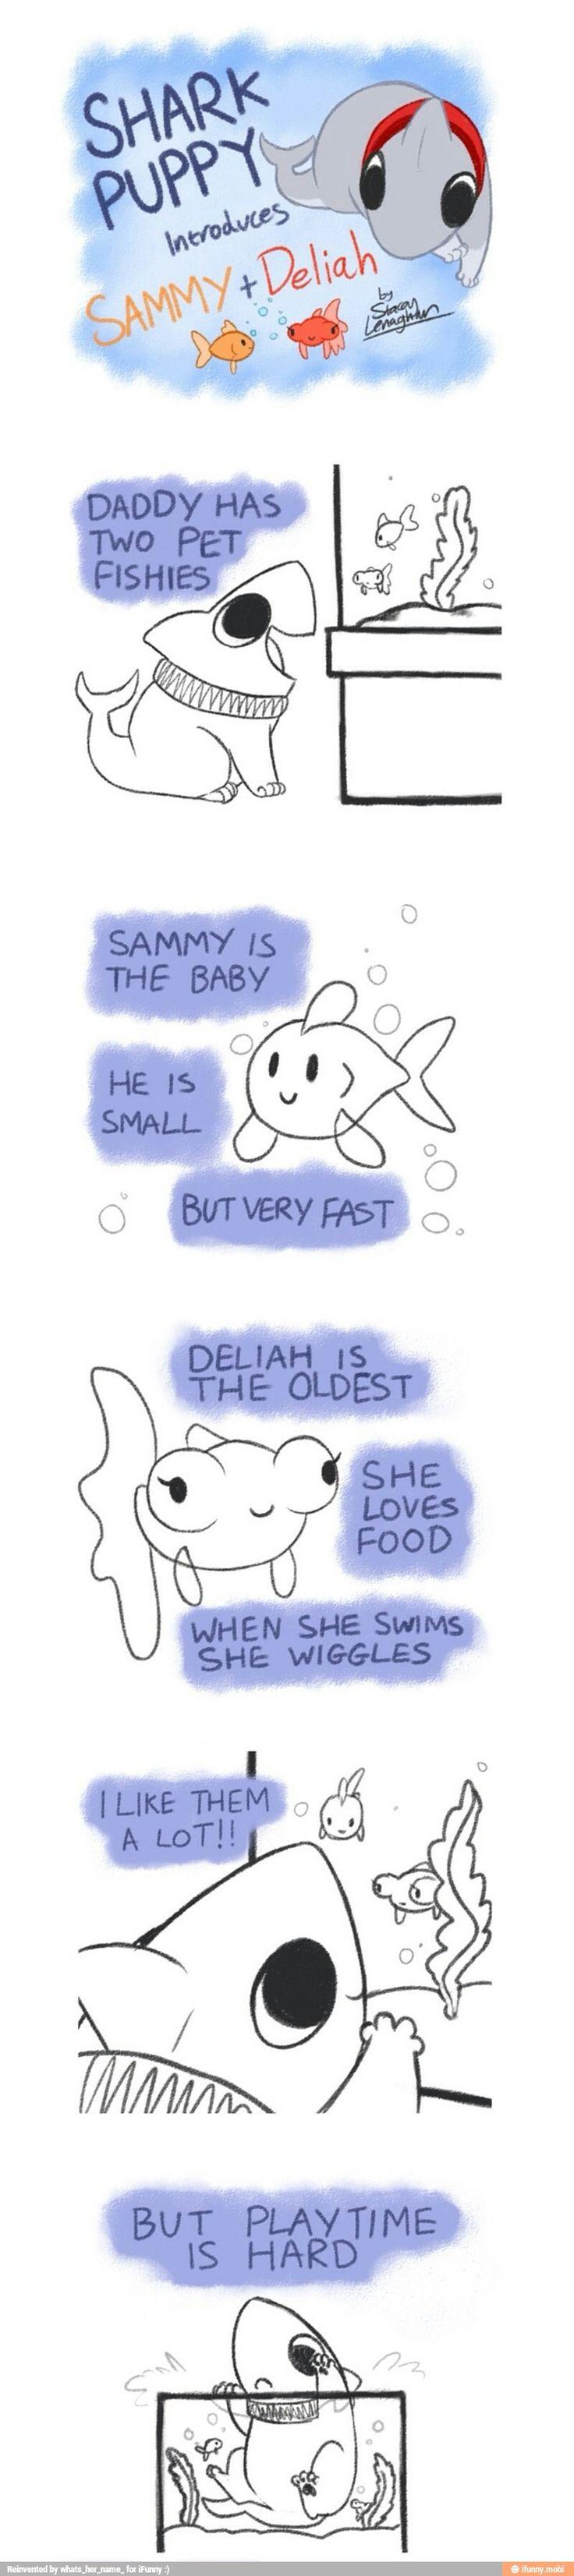 Shark puppy